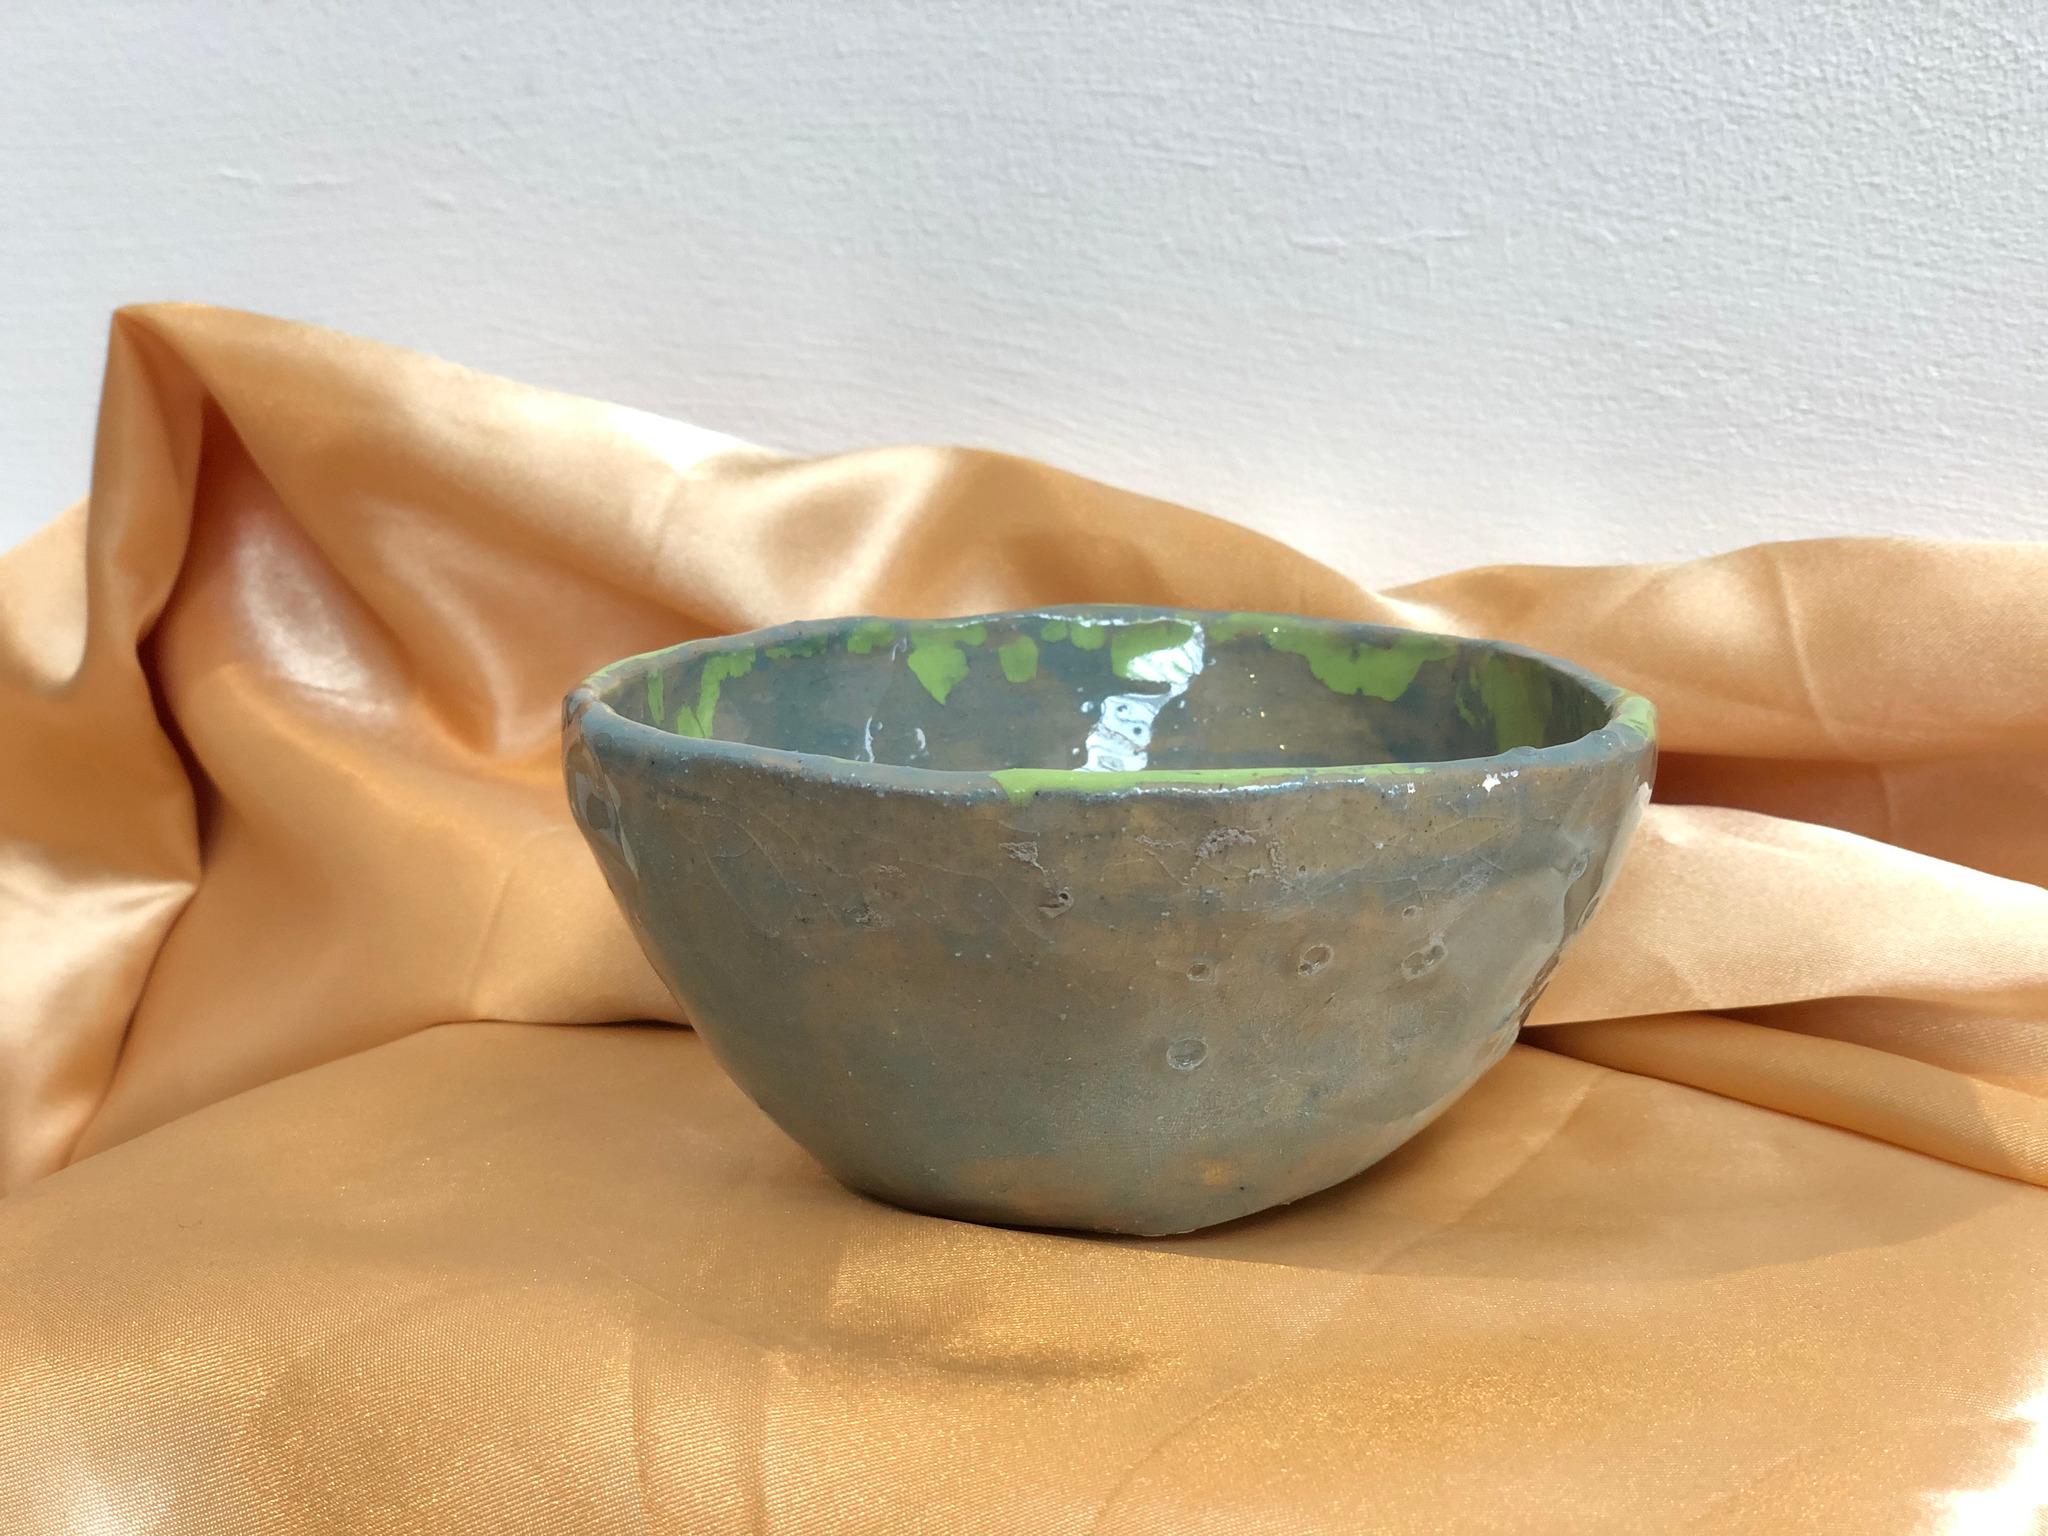 Medium Blue and Green Ceramic Bowl by Alex Sutherland